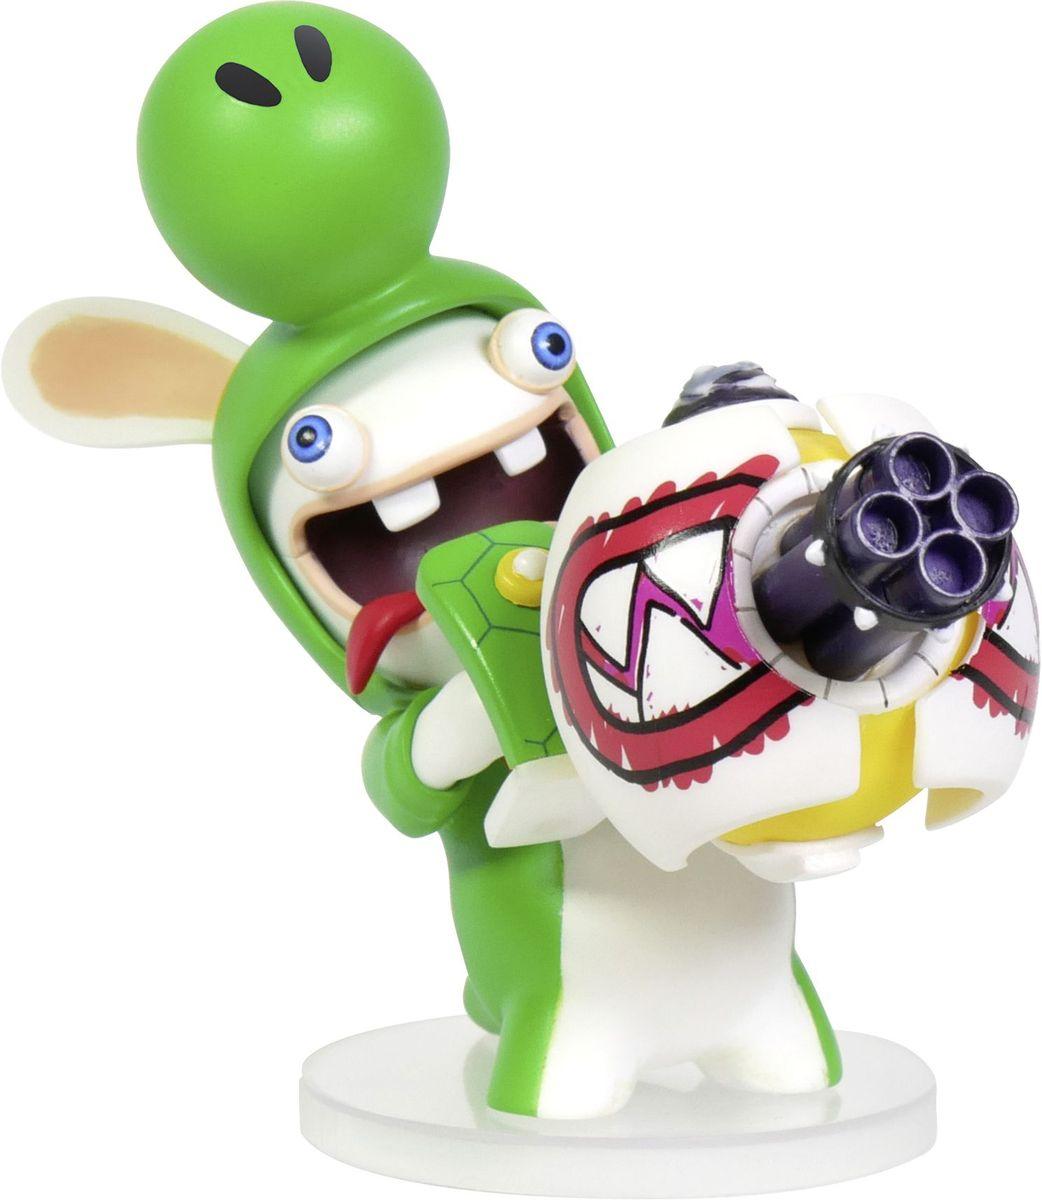 Mario + Rabbids Битва за Королевство. Фигурка Кролик-Йоши 3 фигурка ubisoft mario rabbids битва за королевство – кролик йоши 8 см